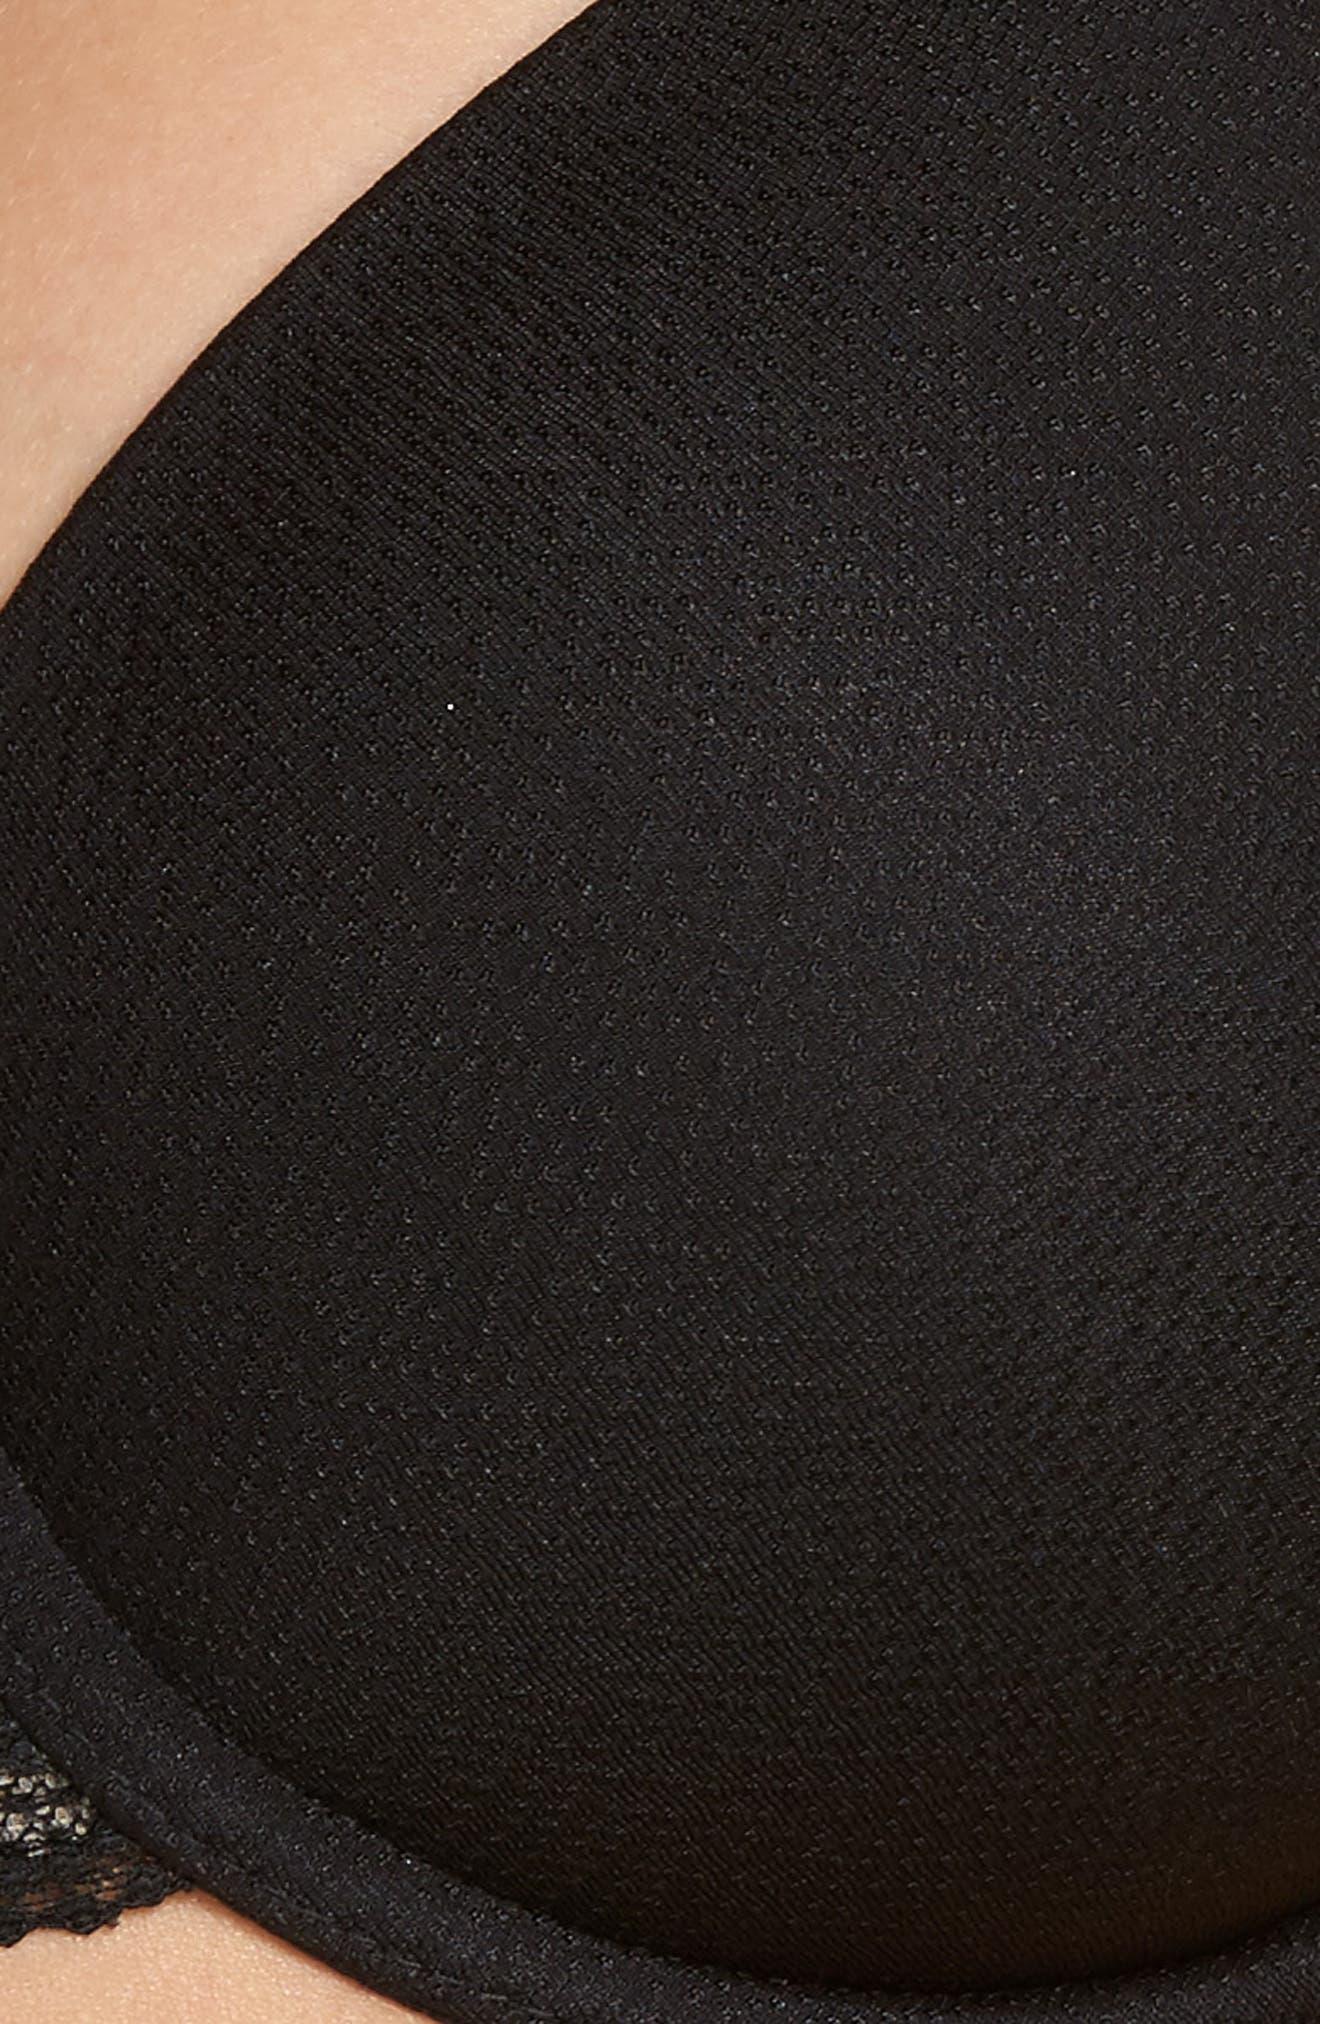 Top Tier Underwire T-Shirt Bra,                             Alternate thumbnail 10, color,                             Black